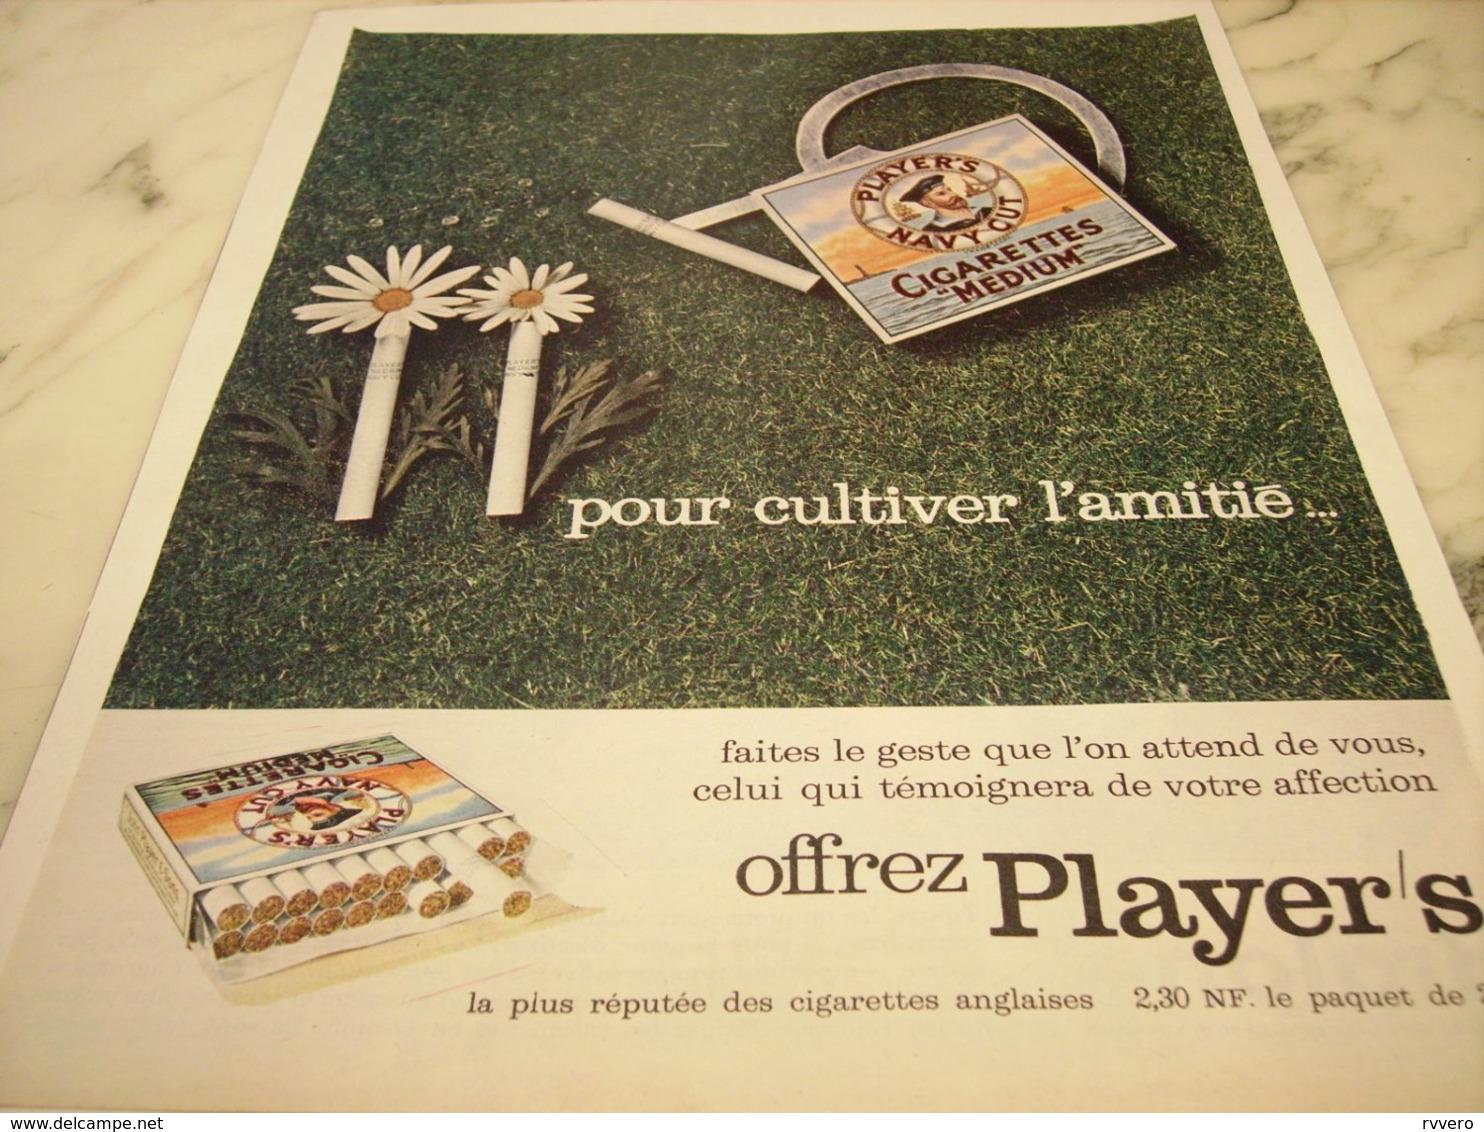 ANCIENNE PUBLICITE   CUTIVER L AMITIE CIGARETTE  MEDIUM PLAYER S 1961 - Sonstige